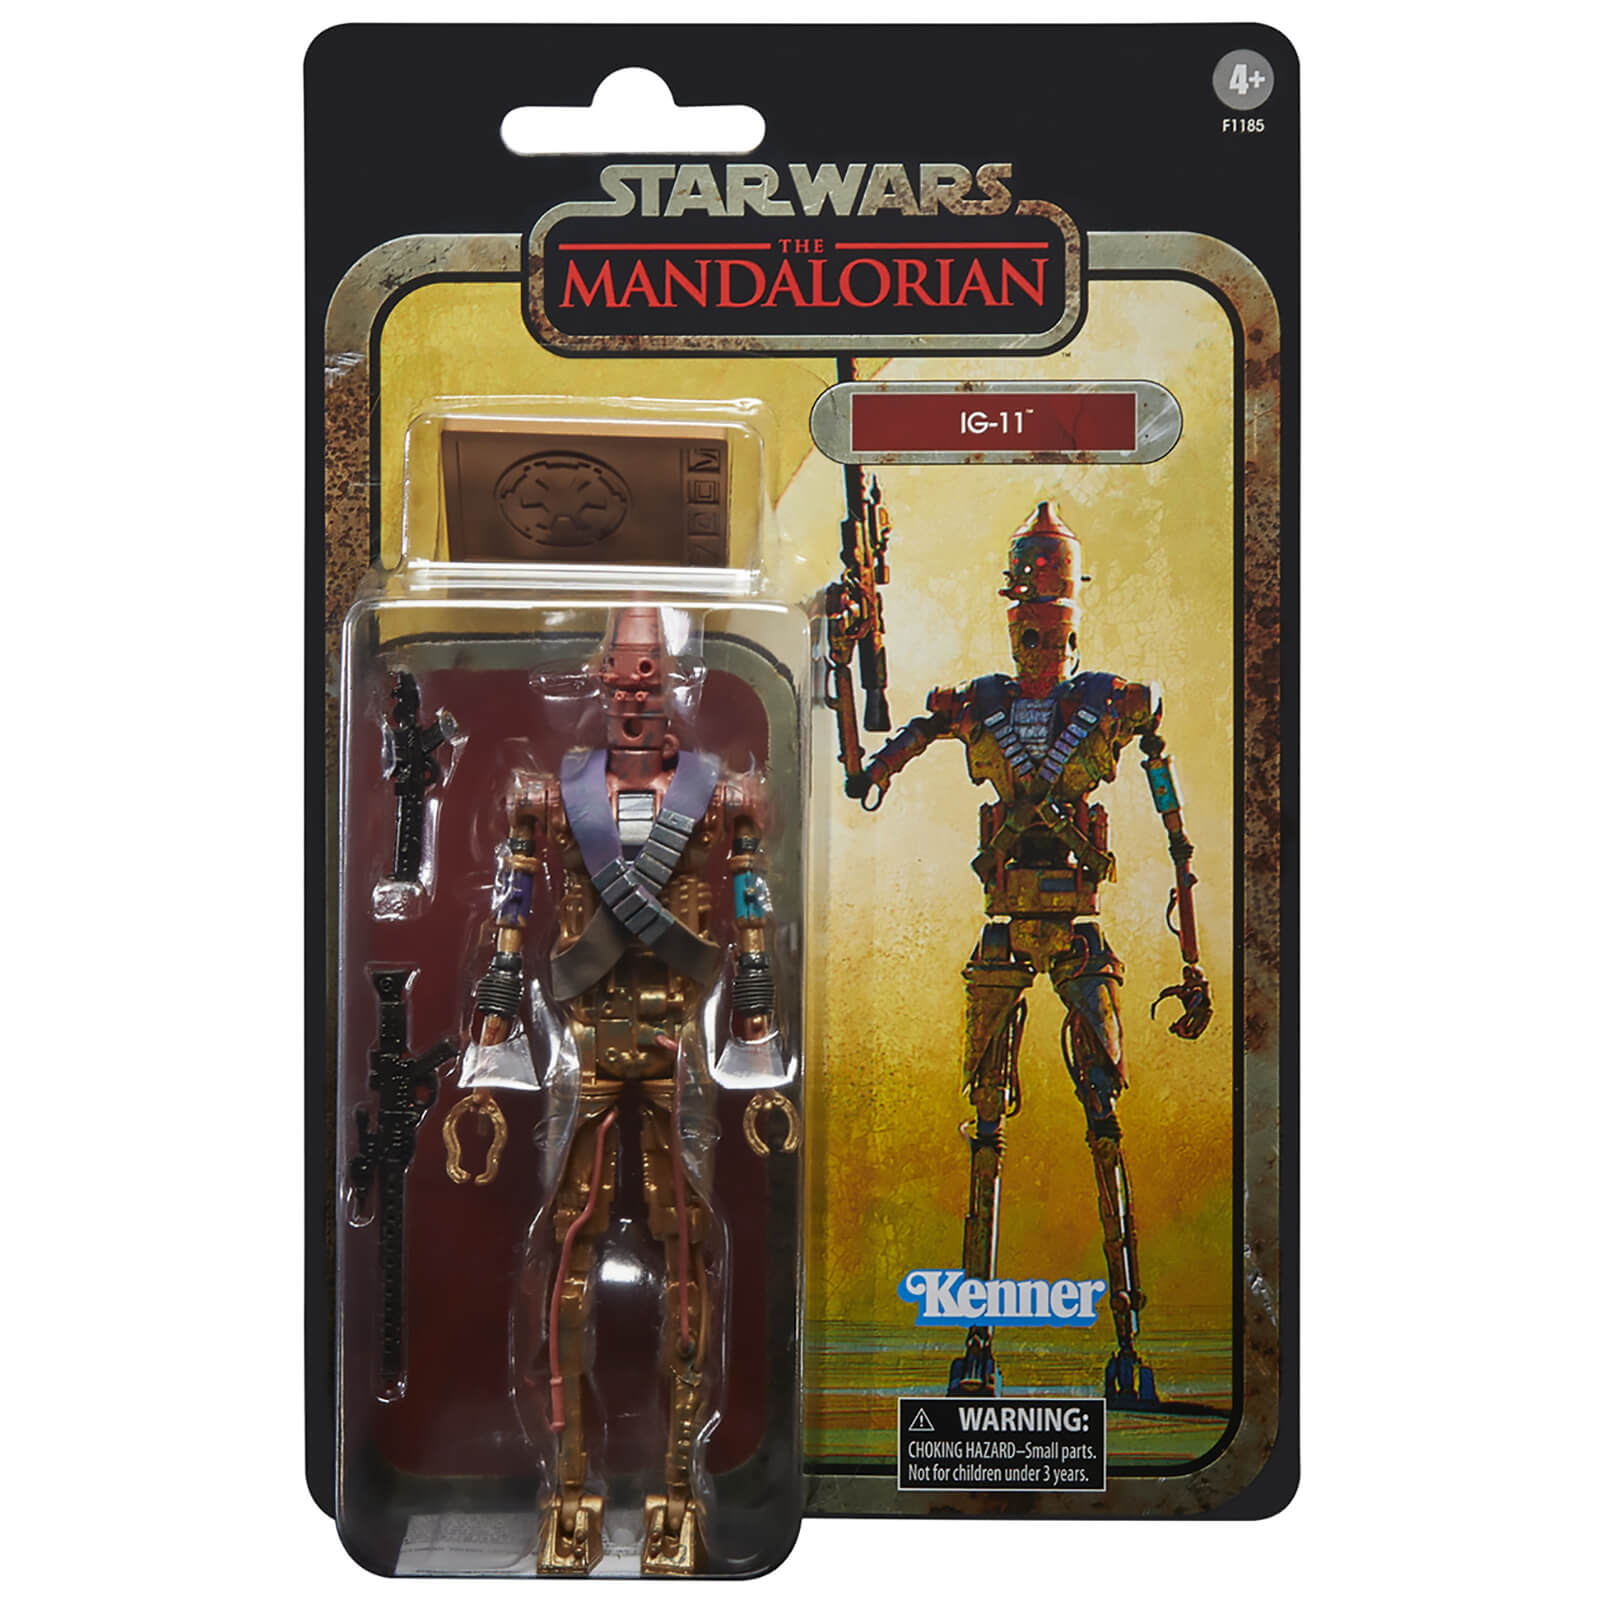 Image of Hasbro Star Wars The Black Series The Mandalorian IG-11 Action Figure